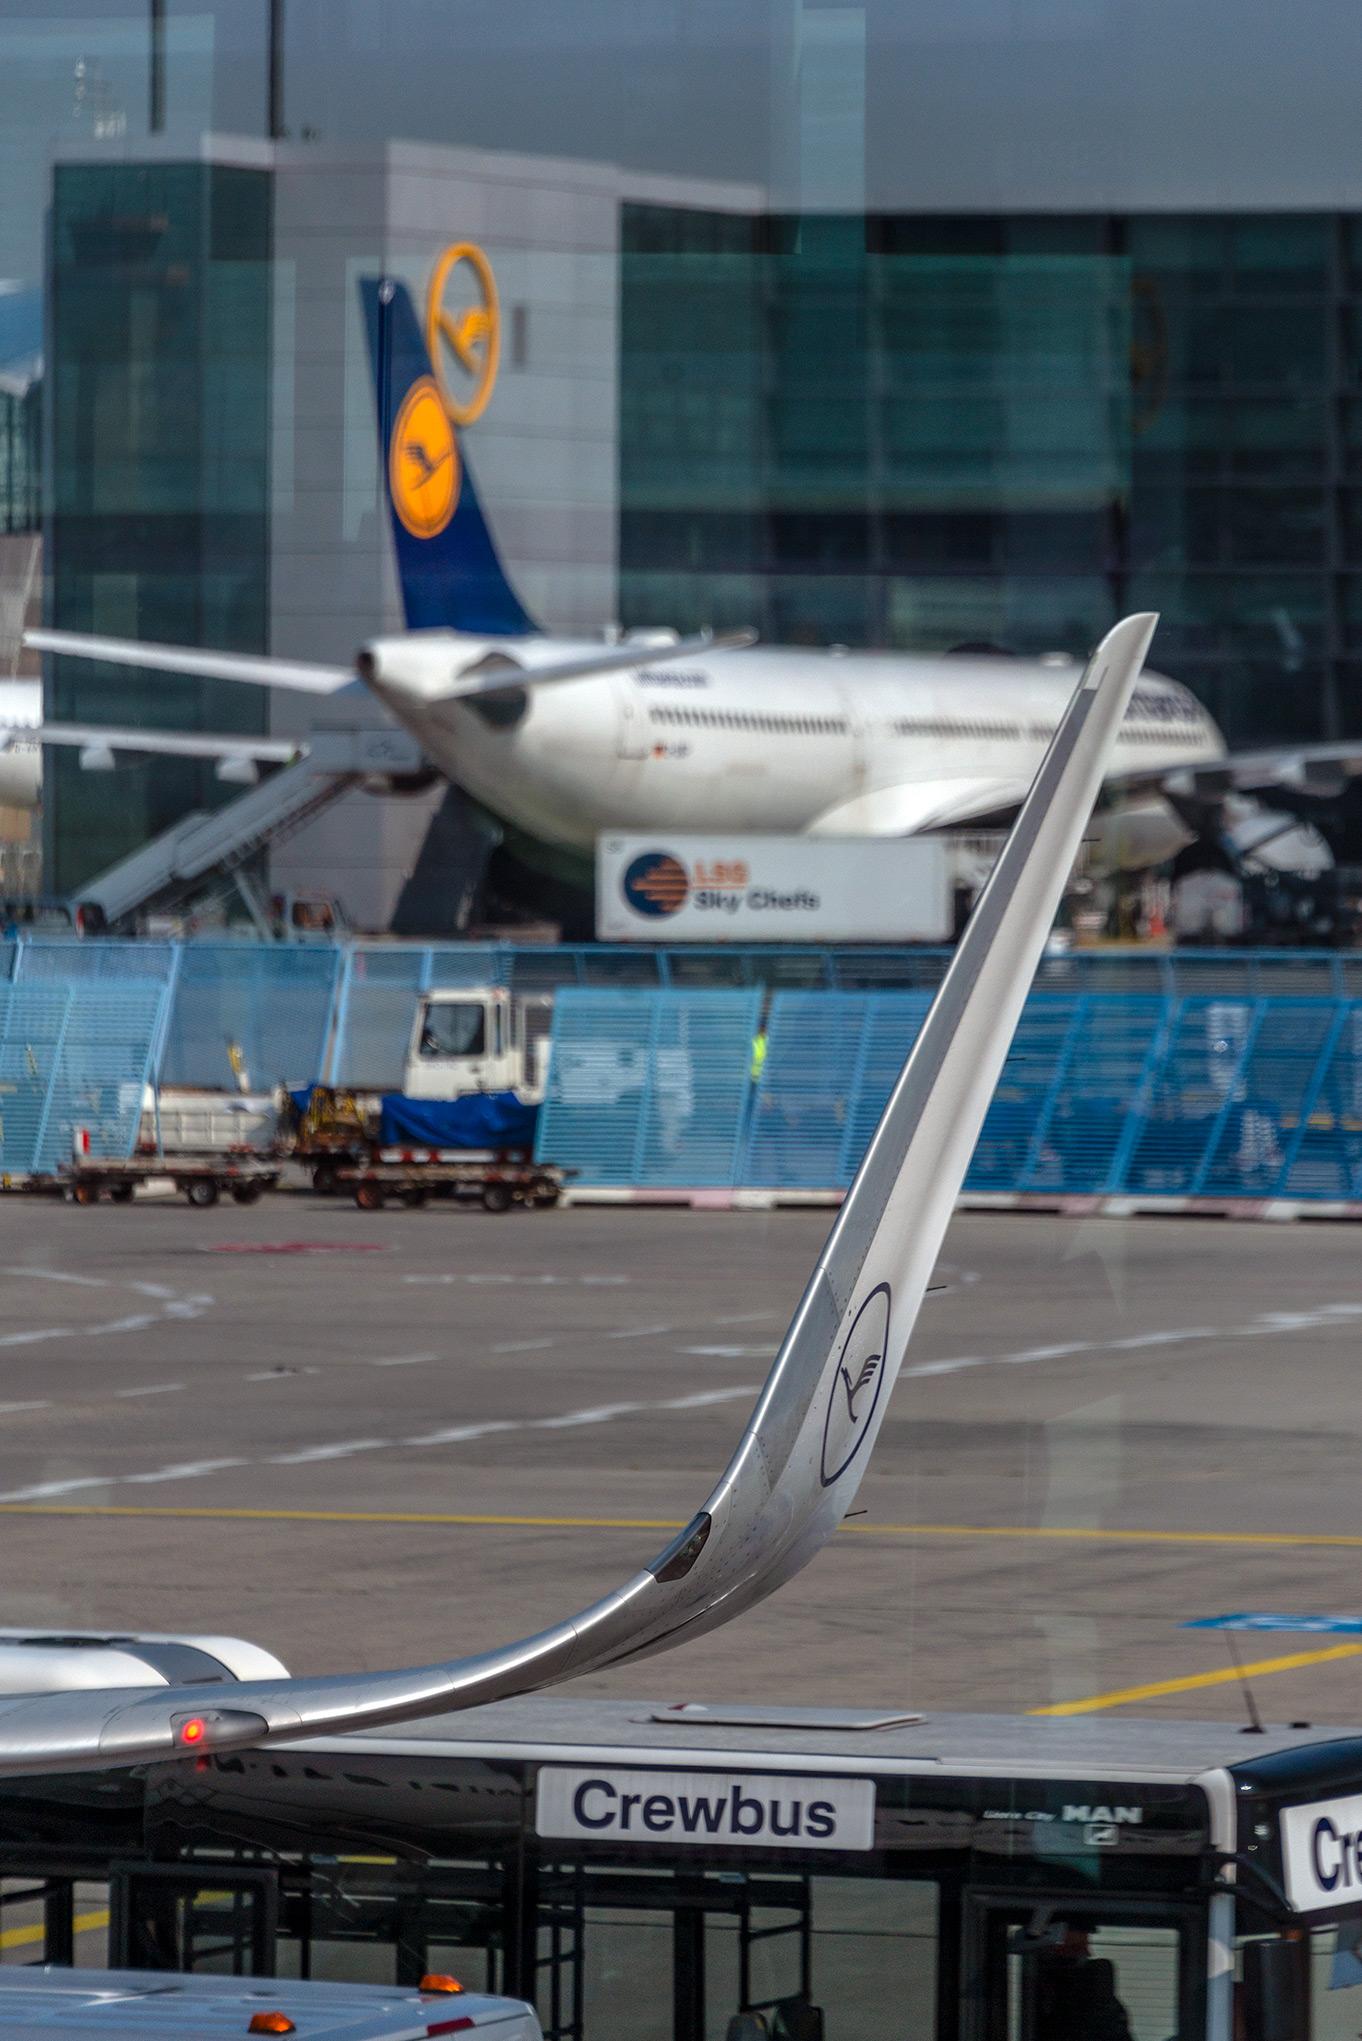 Frankfurt airport and Lufthansa winglet